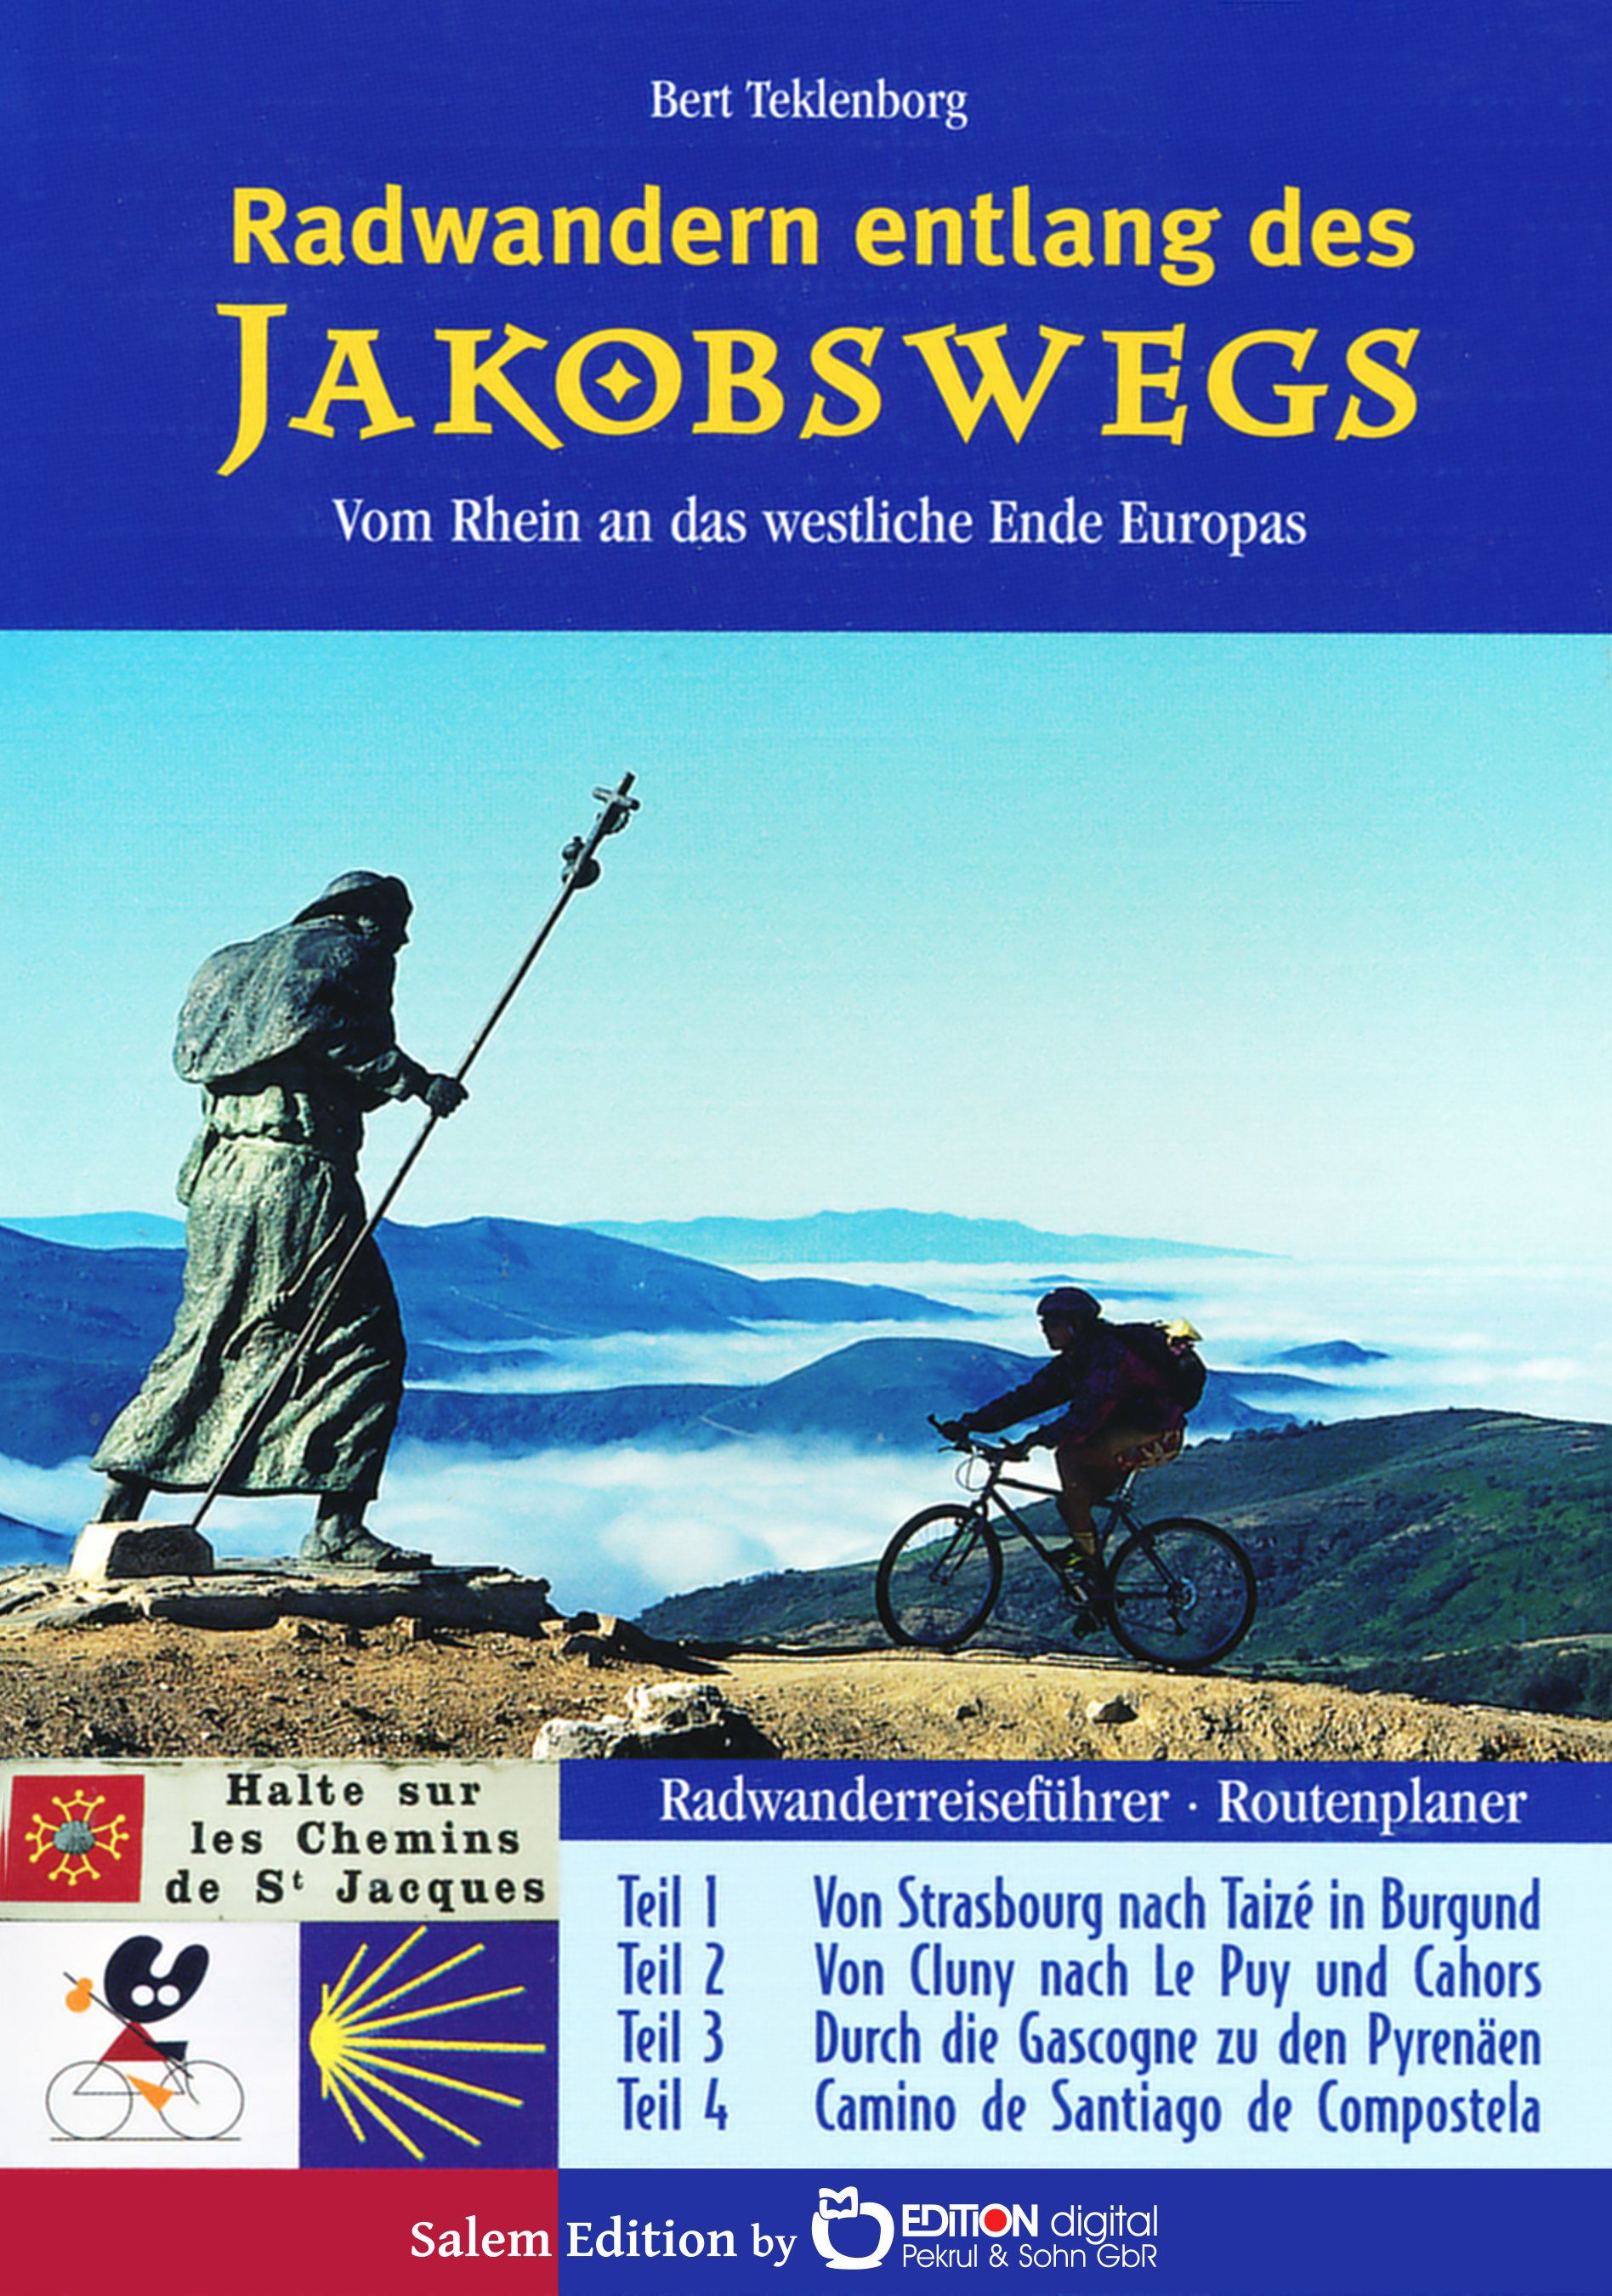 2019-12-12 Radwandern